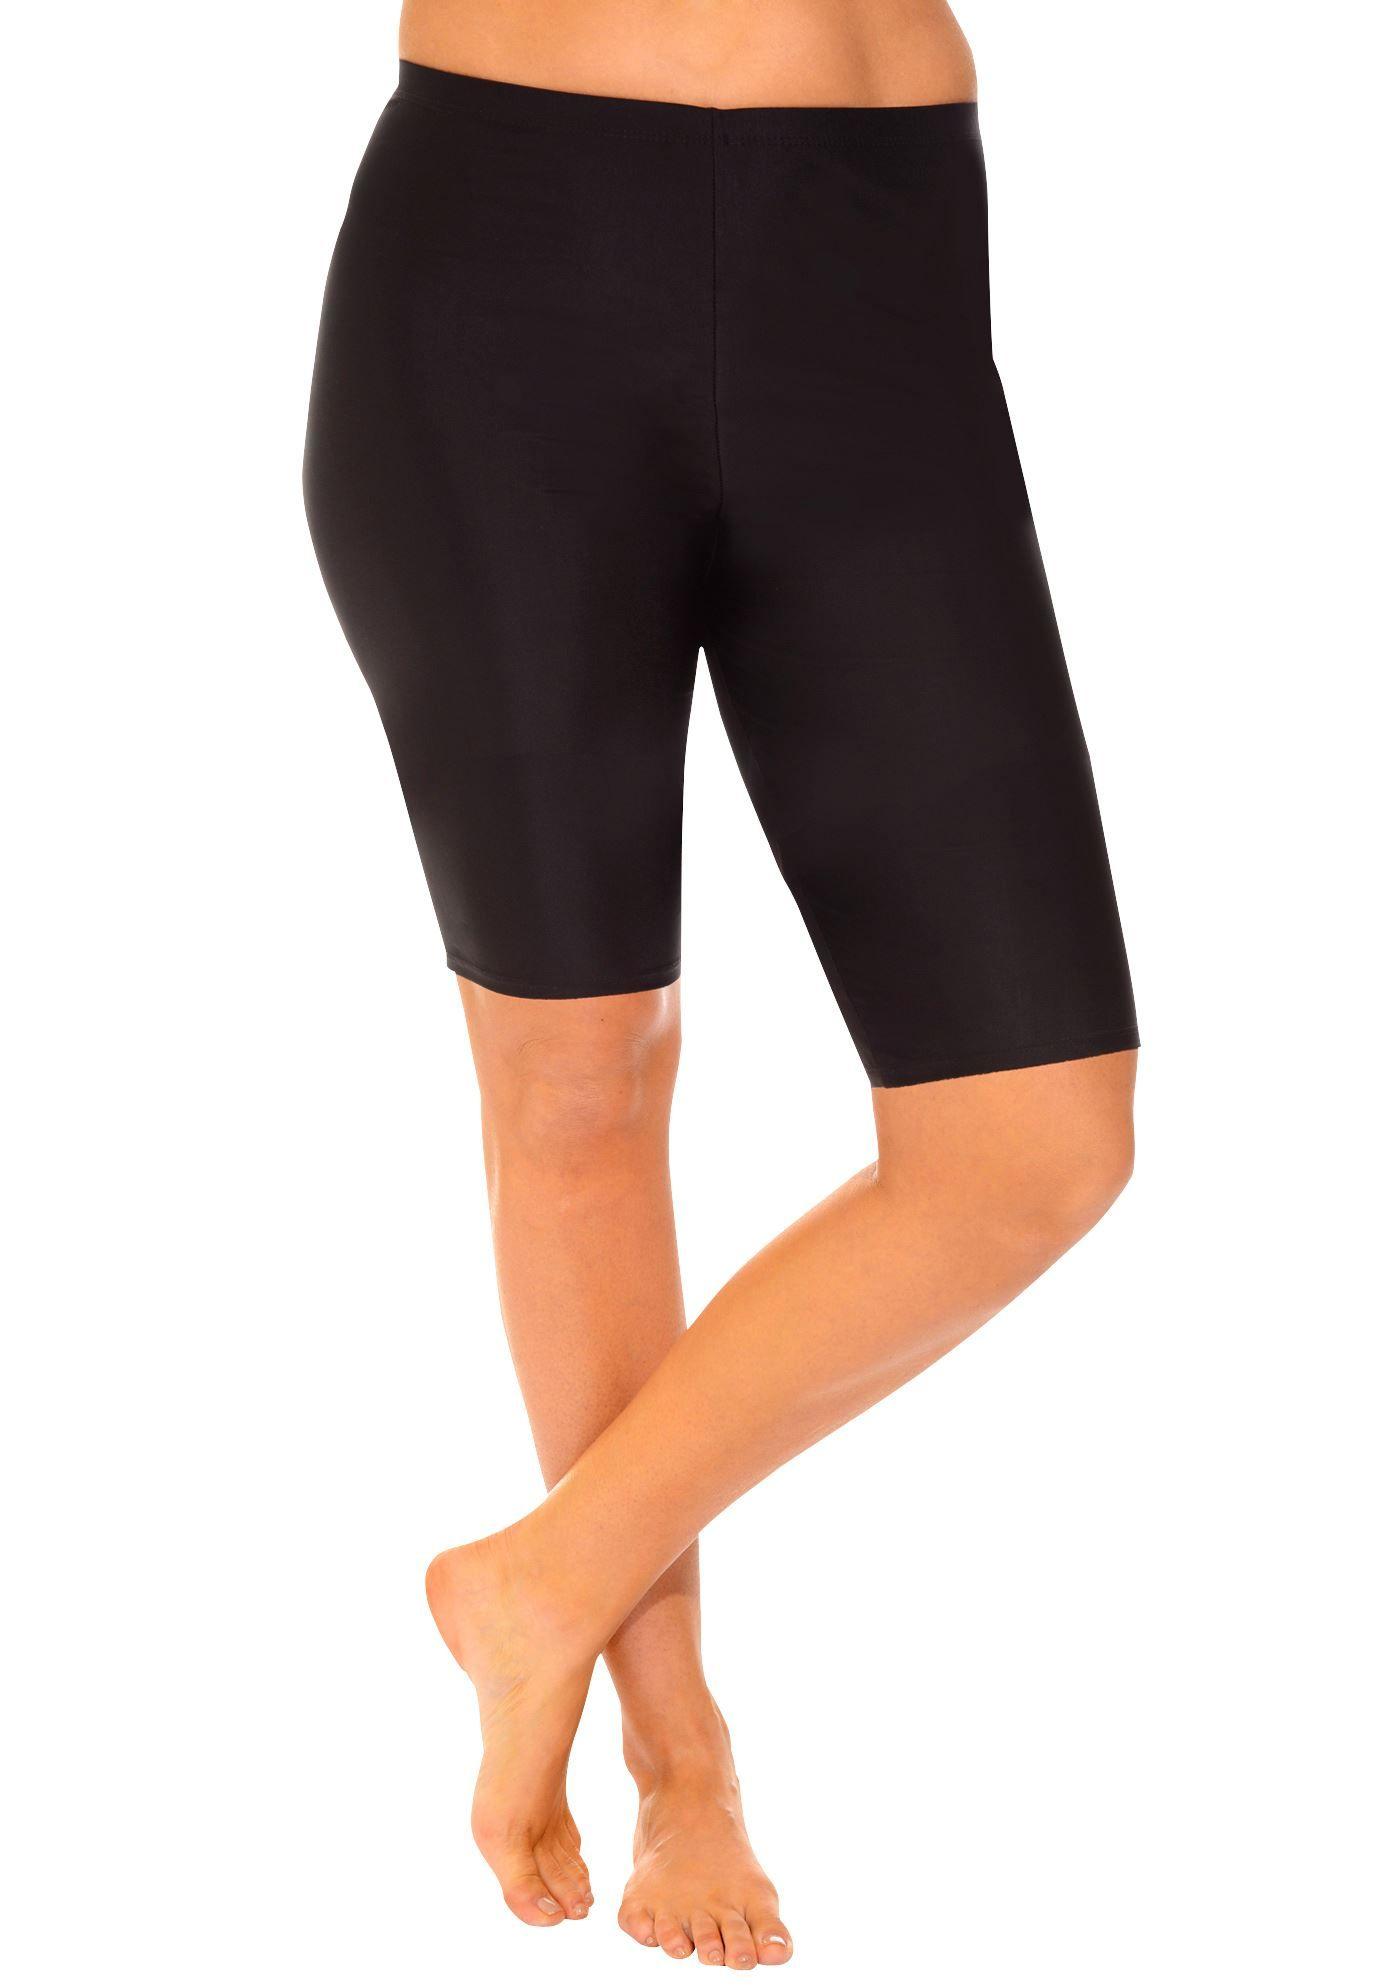 028ef738d629c Plus Size Aquabelle Extended Length Bike Short | Clothing | Women's ...